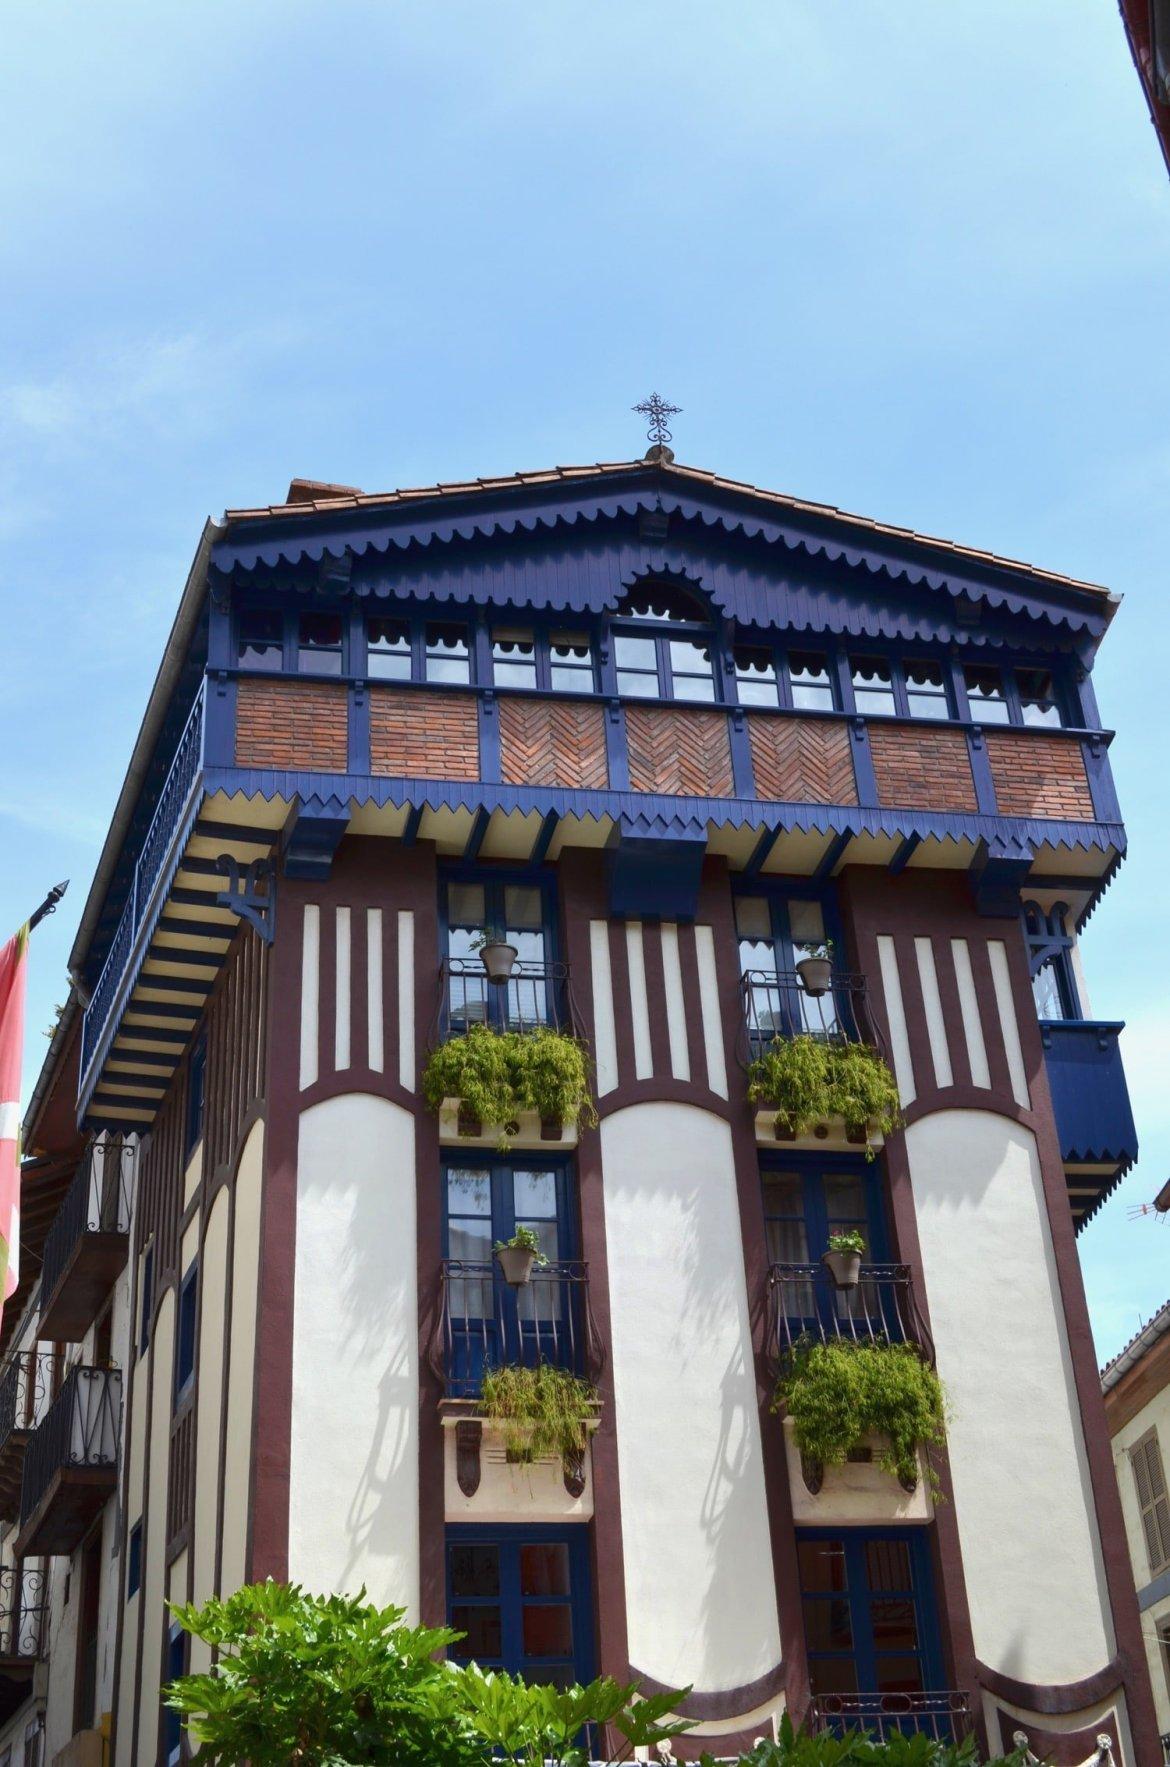 Mutriku-du-pays-basque-espagnol-architecture